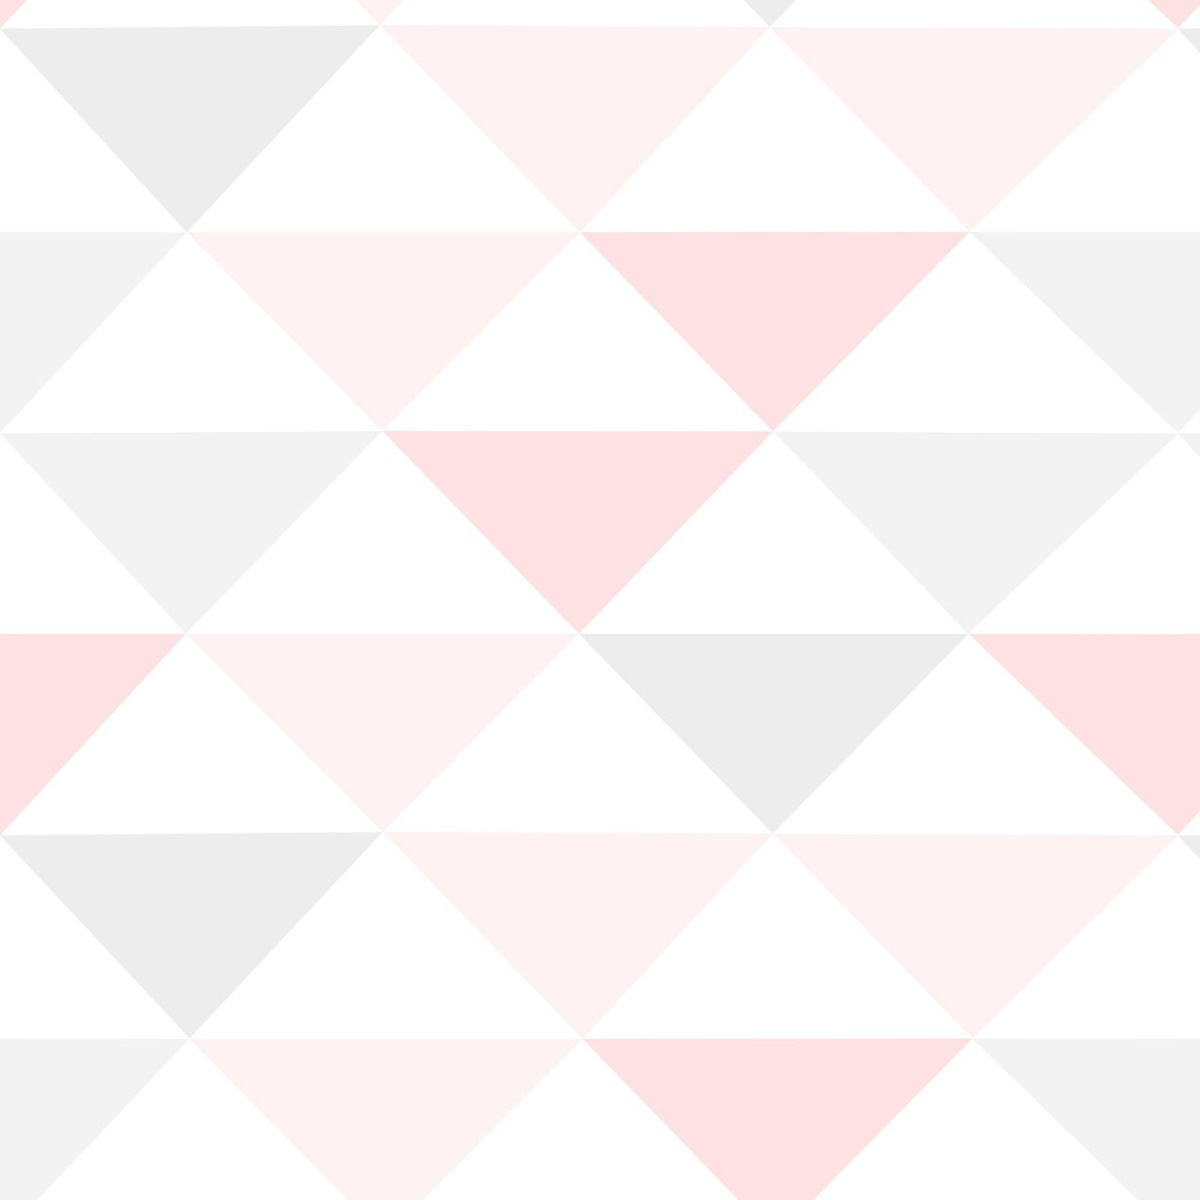 Papel de parede geom trico vinil menina triangulo rosa 3 - Cenefas de papel para paredes ...